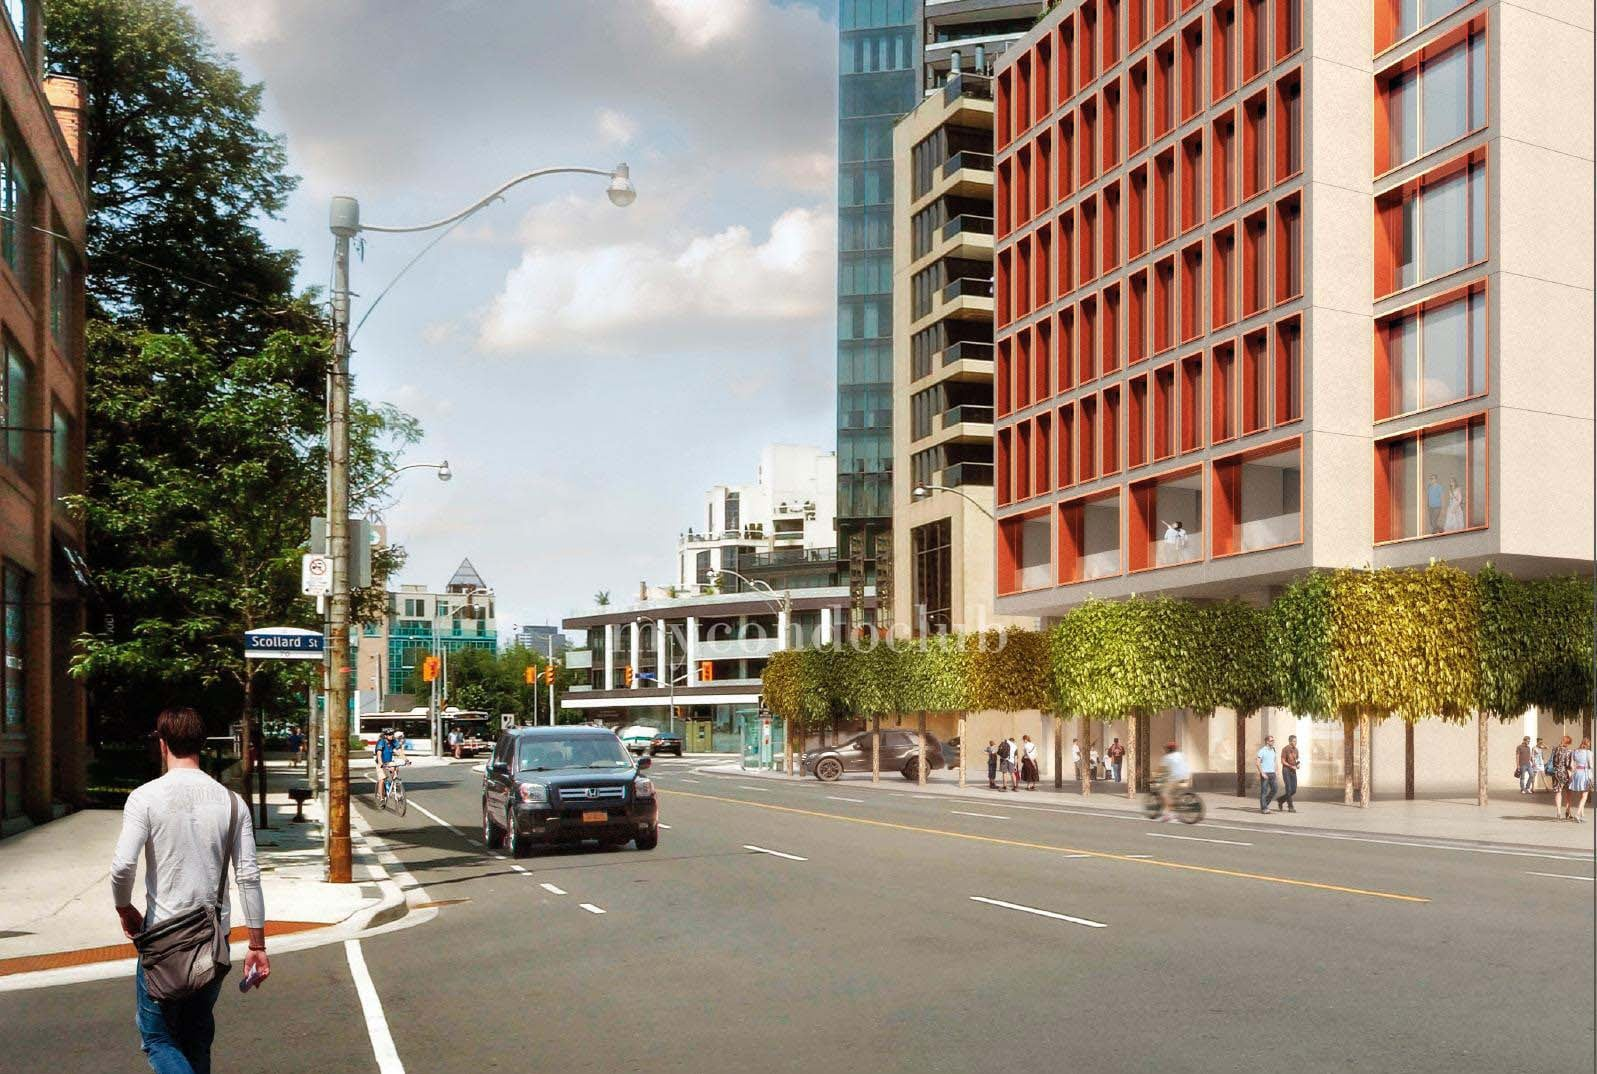 50-Scollard-Street-Condos-lanterradevelopments-DowntownToronto-50ScollardStTorontoON-M5R1E9-mycondoclub